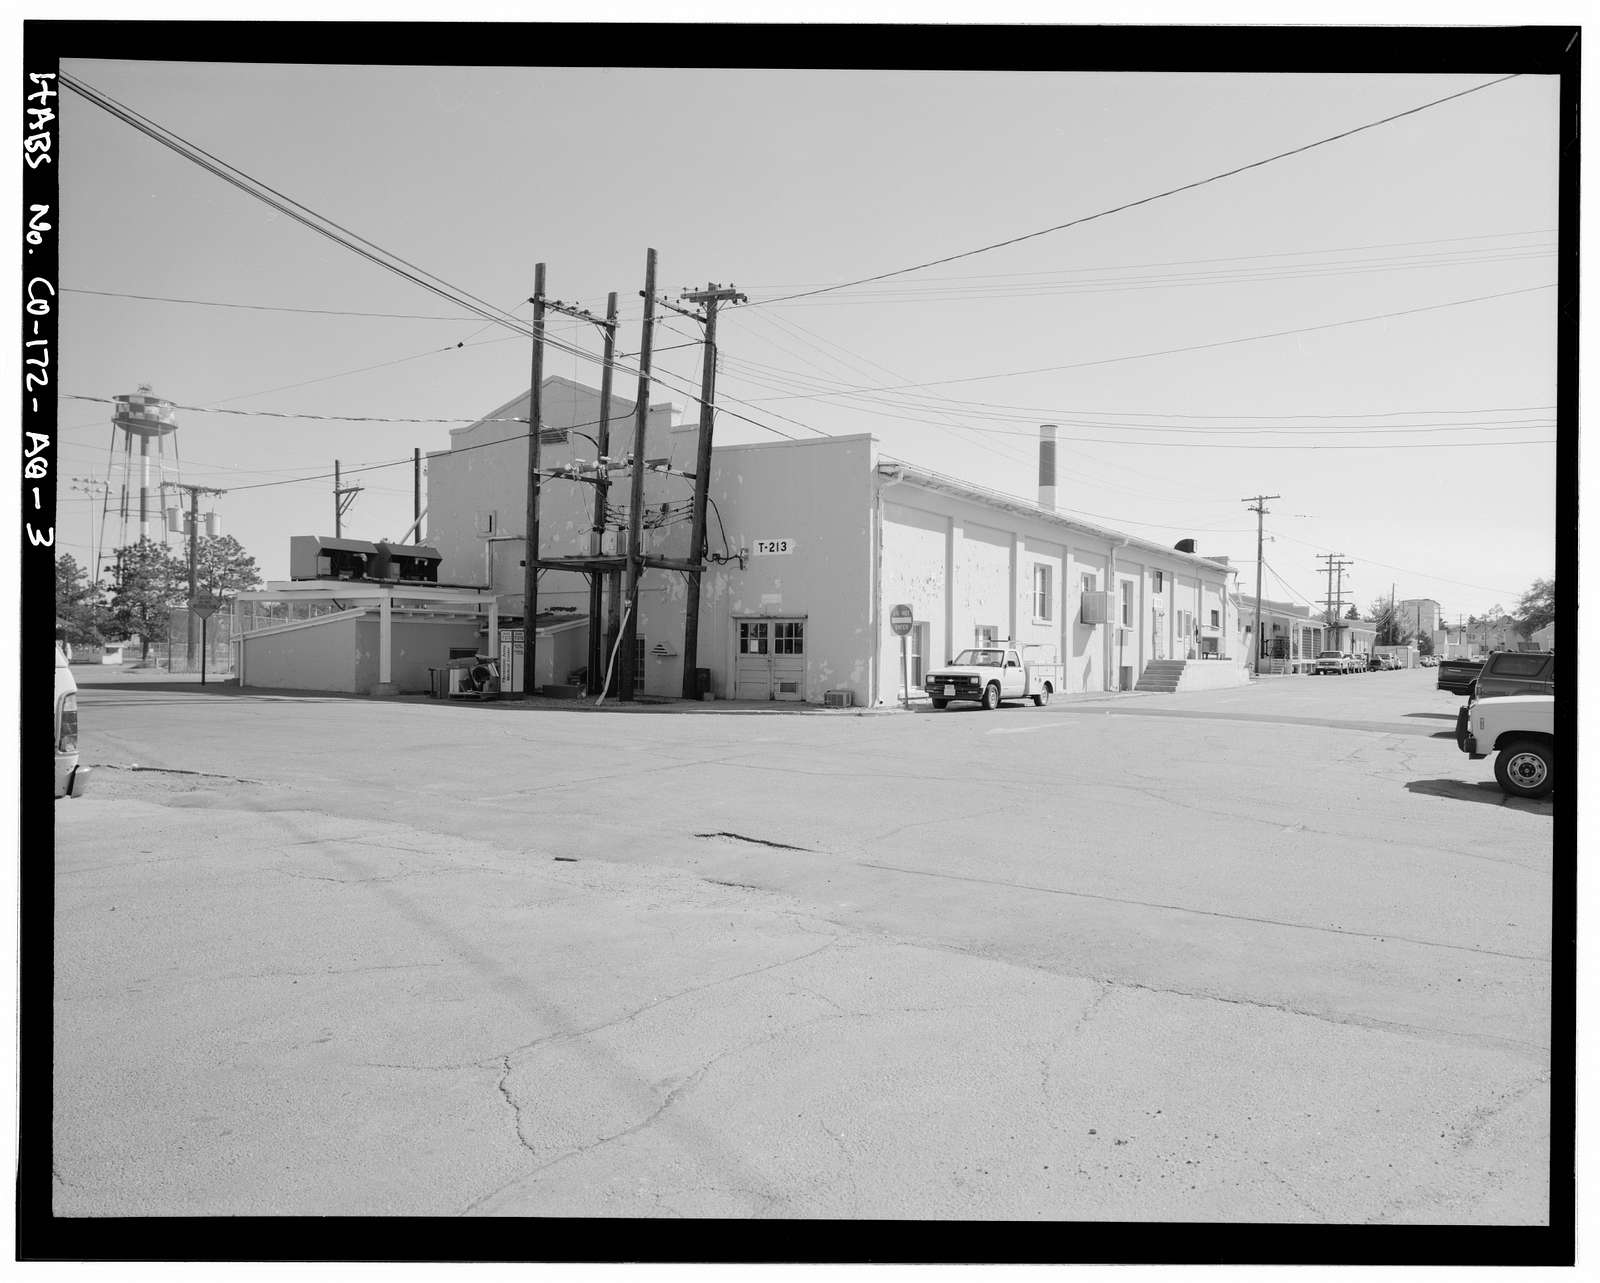 Fitzsimons General Hospital, Ice Plant, Southwest Corner of East I Avenue & North Thirteenth Street, Aurora, Adams County, CO